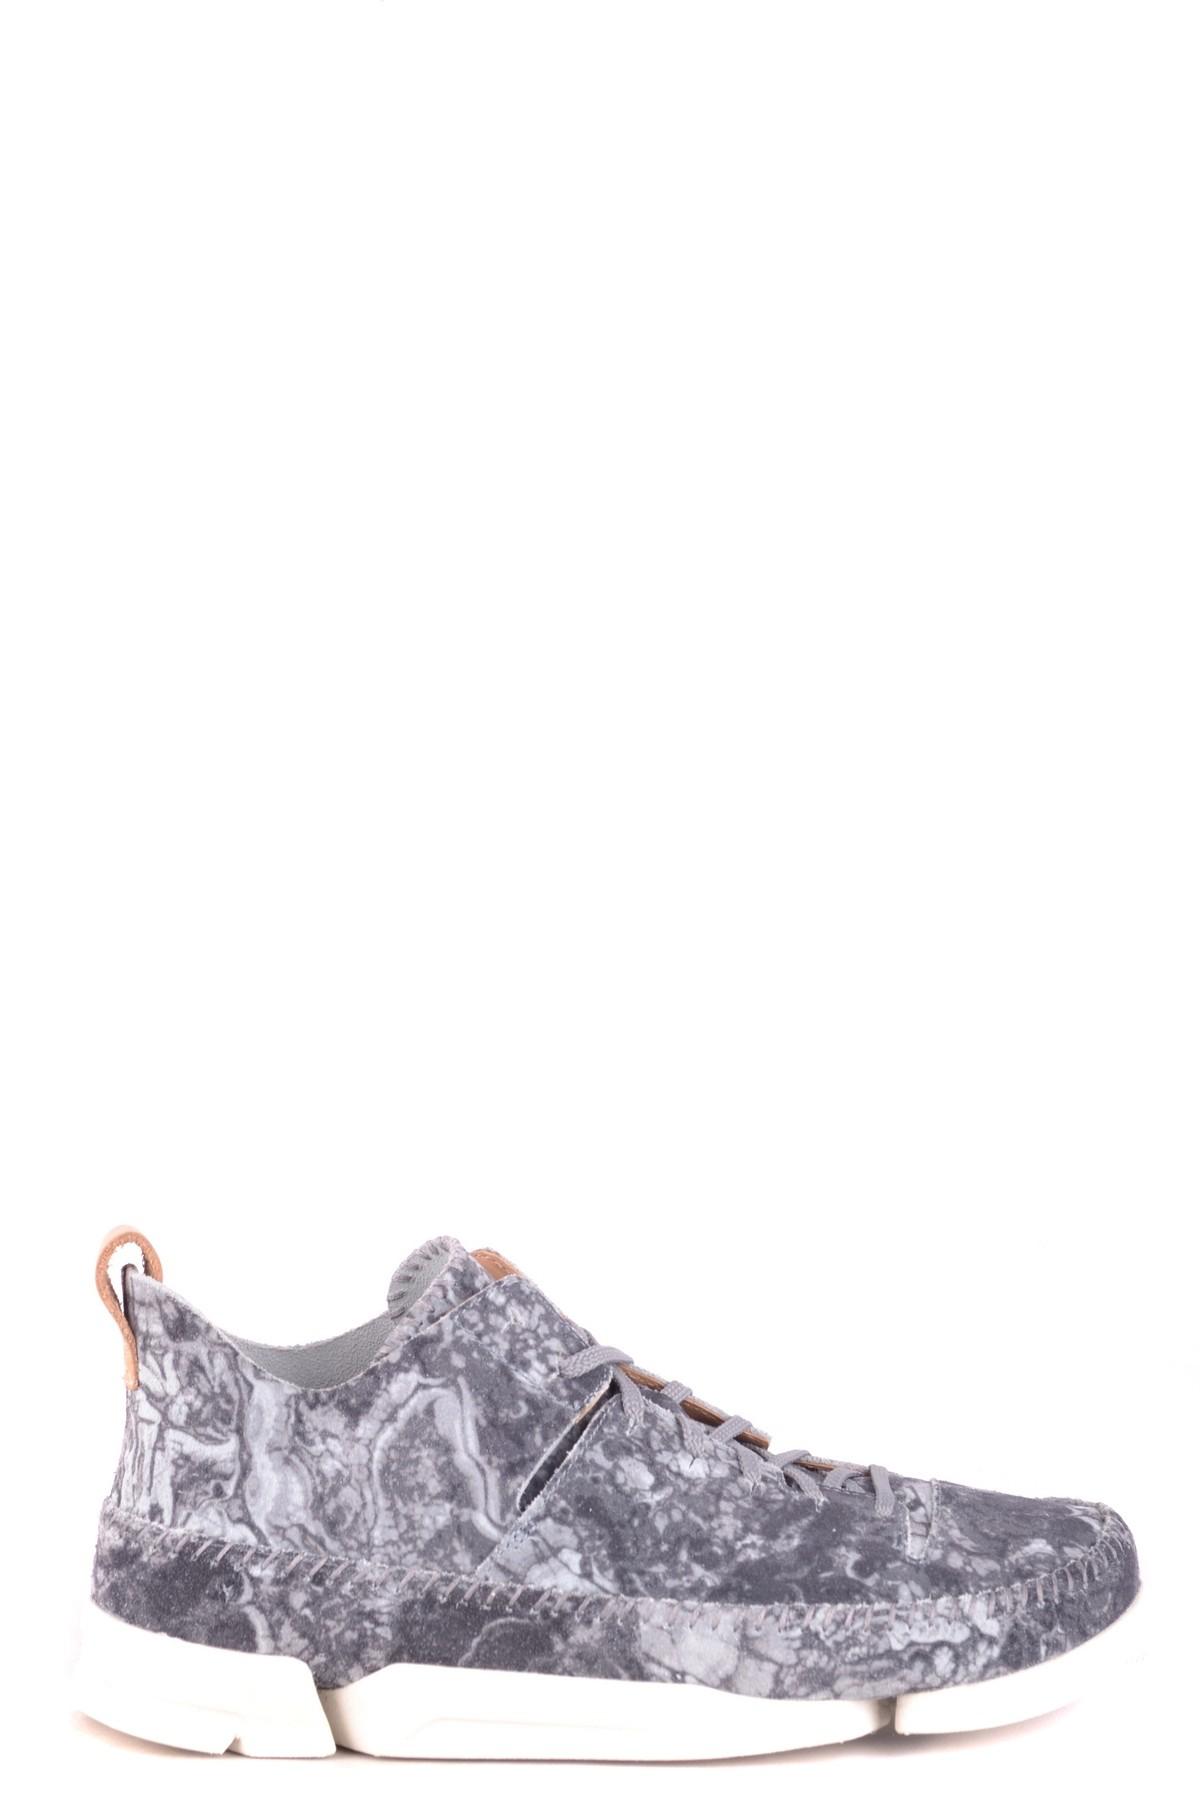 Clarks Sneakers Uomo